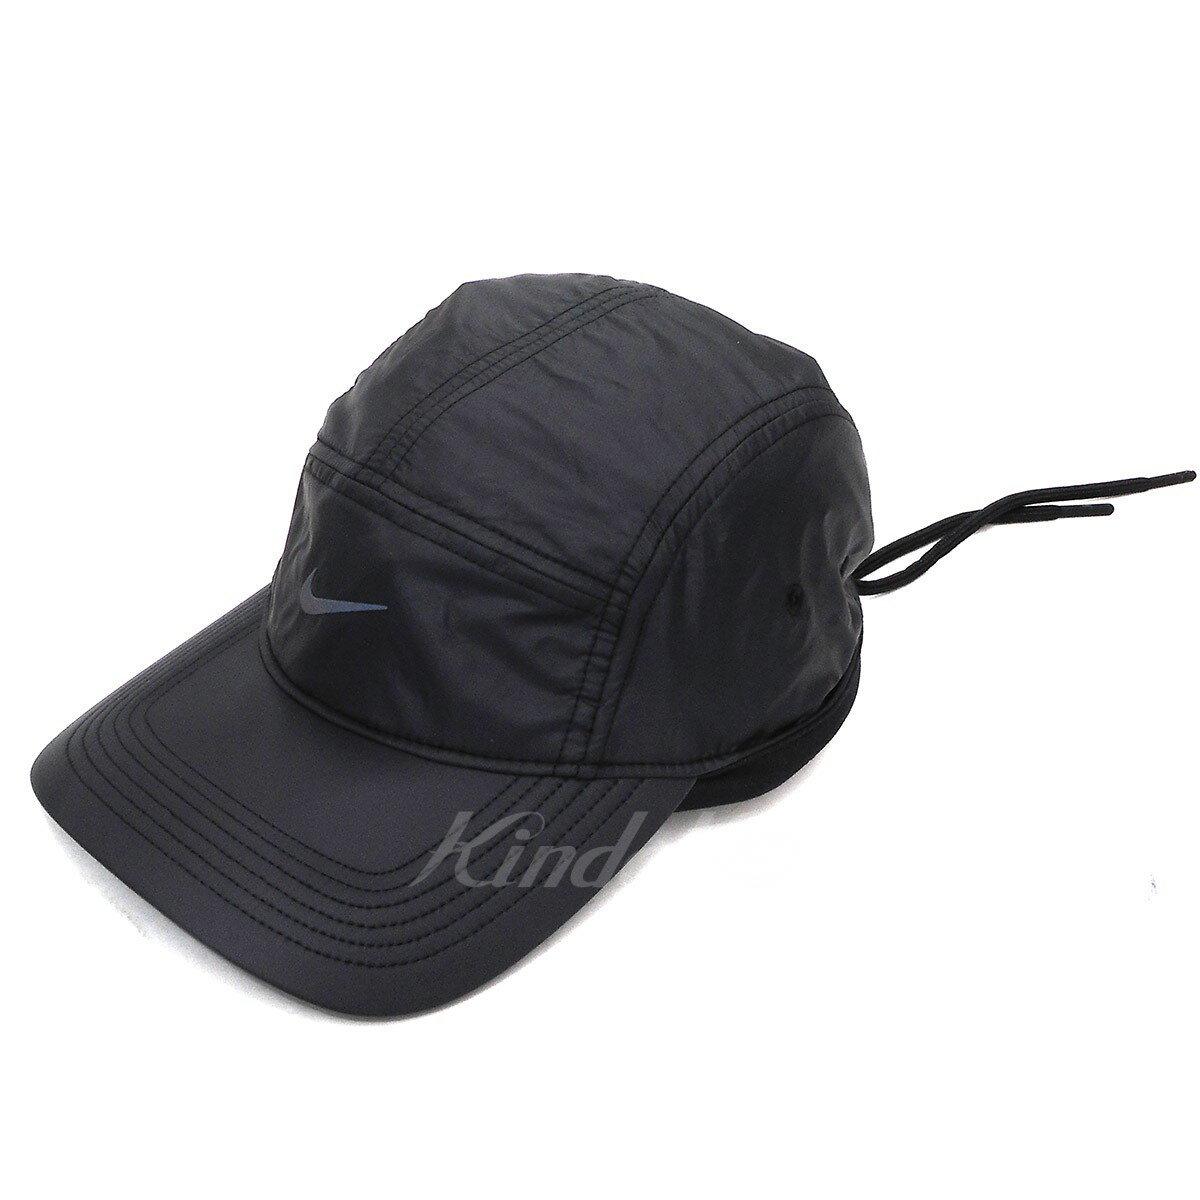 305d57ac2a3 kindal  FEAR OF GOD X NIKE AW84 adjuster bulldog cap black (Fear of ...